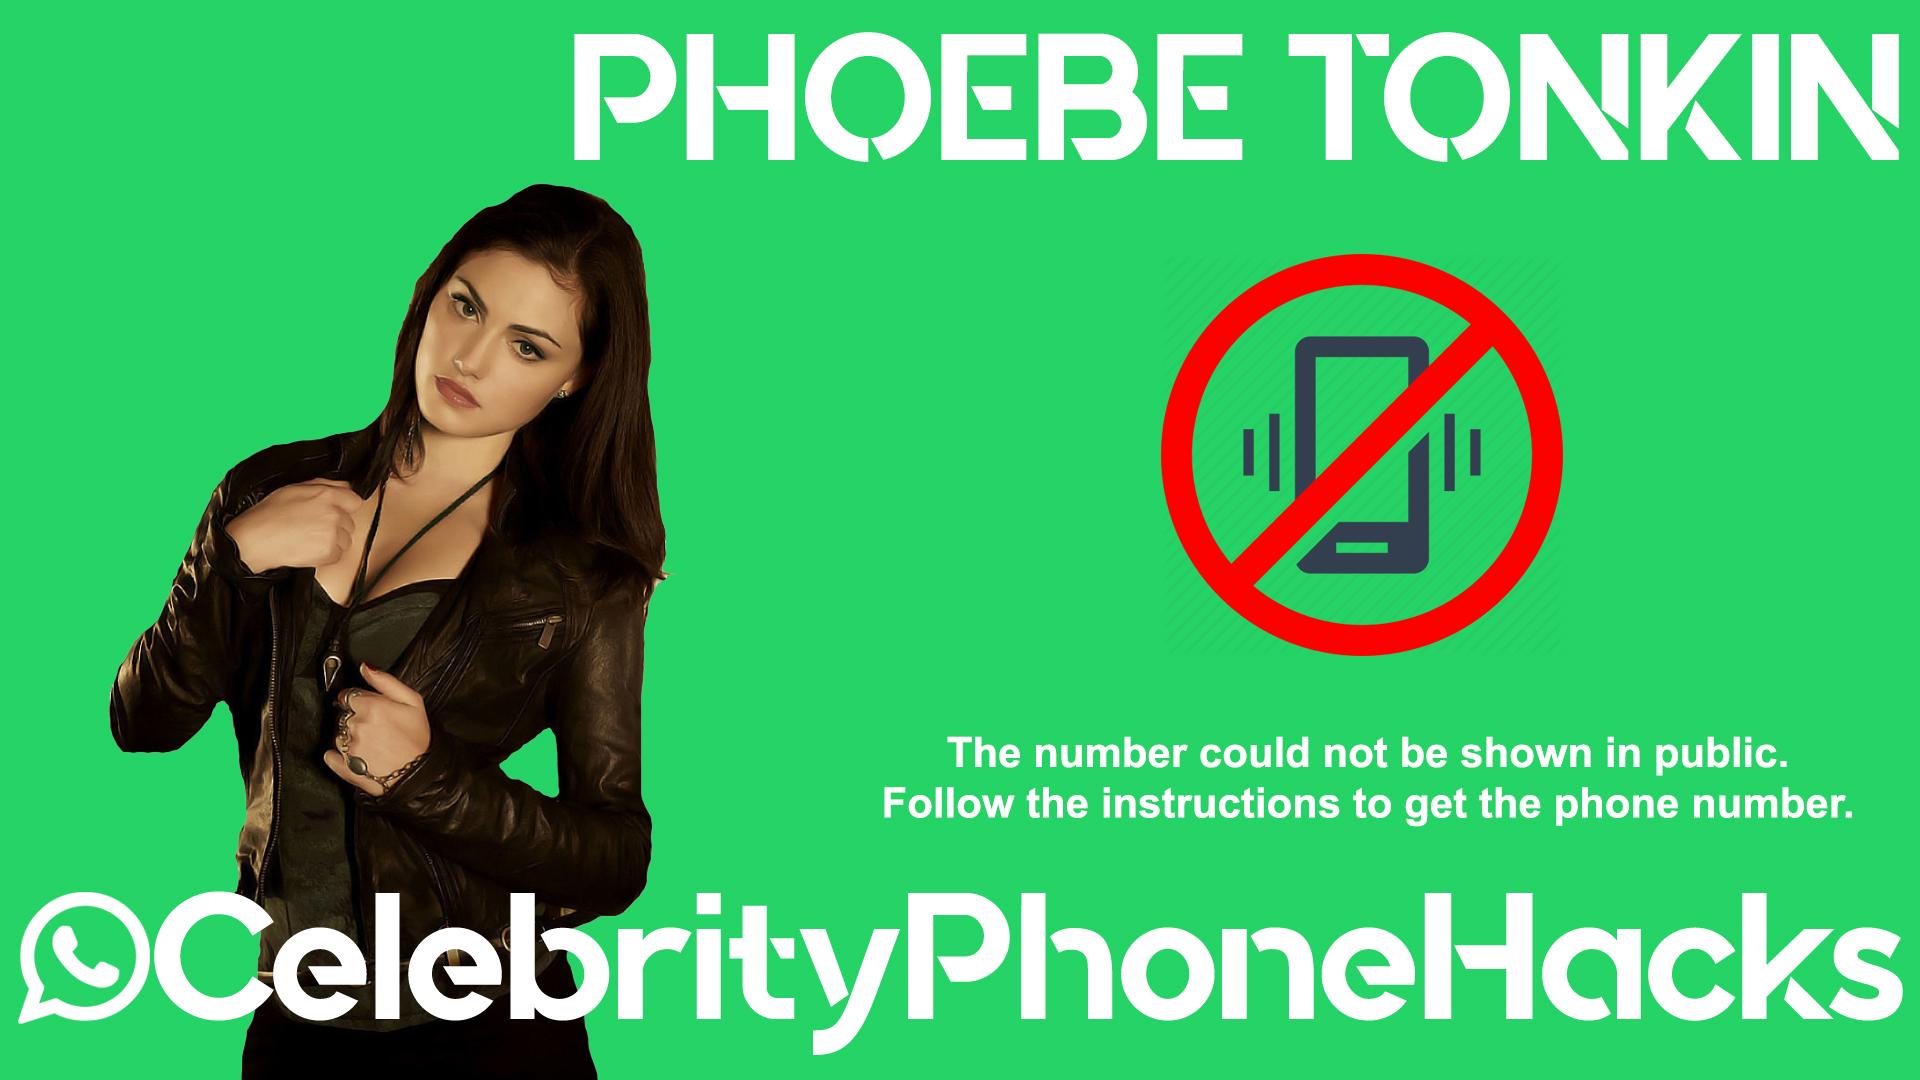 Phoebe Tonkin real phone number 2019 whatsapp hacked leaked